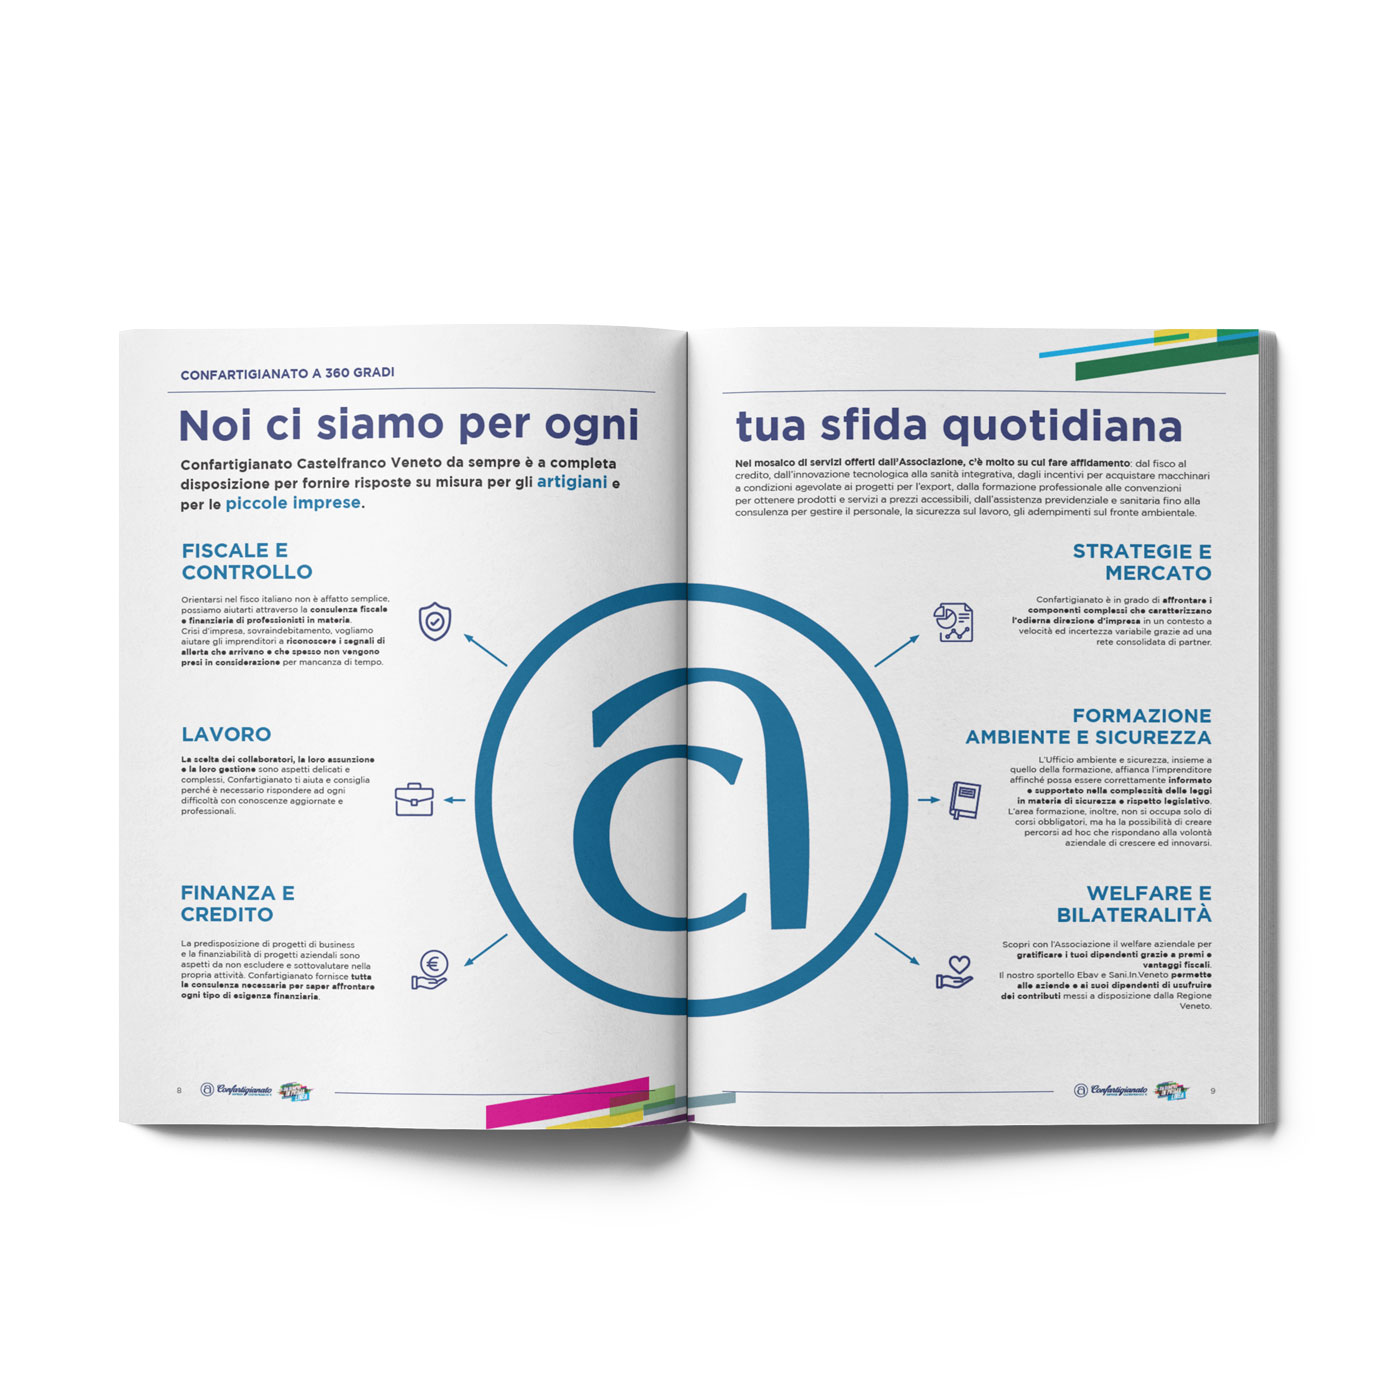 confartigianato-catalogo-1